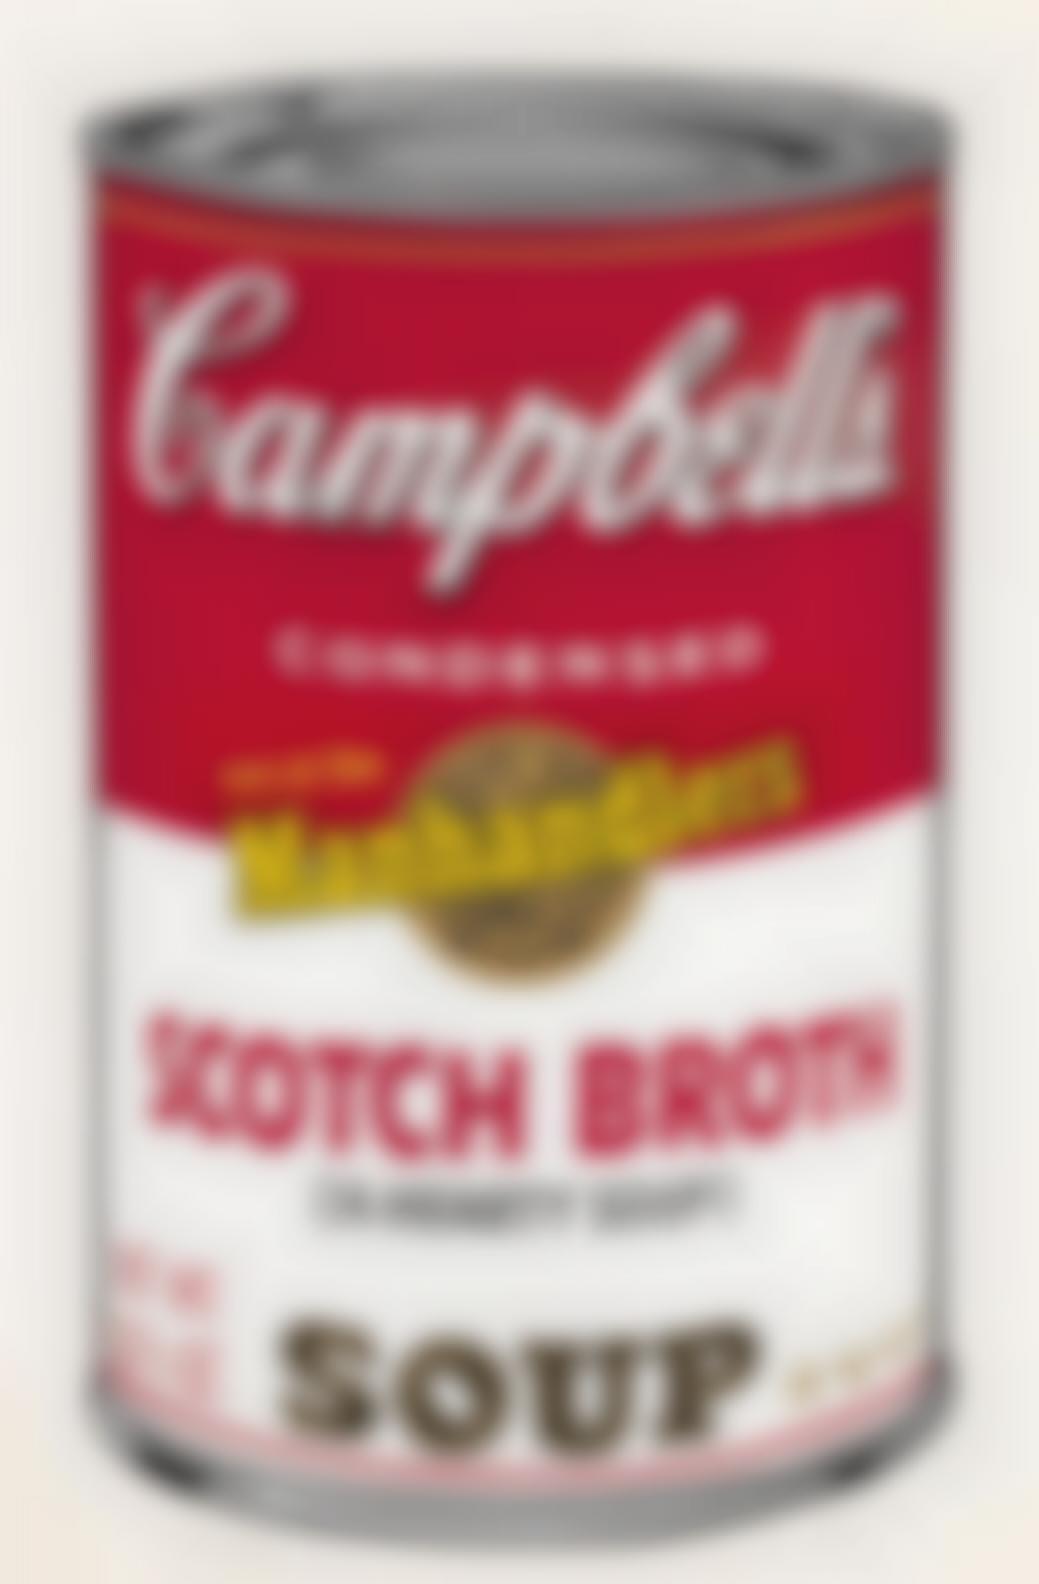 Andy Warhol-Scotch Broth, From Campbells Soup II (Feldman & Schellmann II.55)-1969